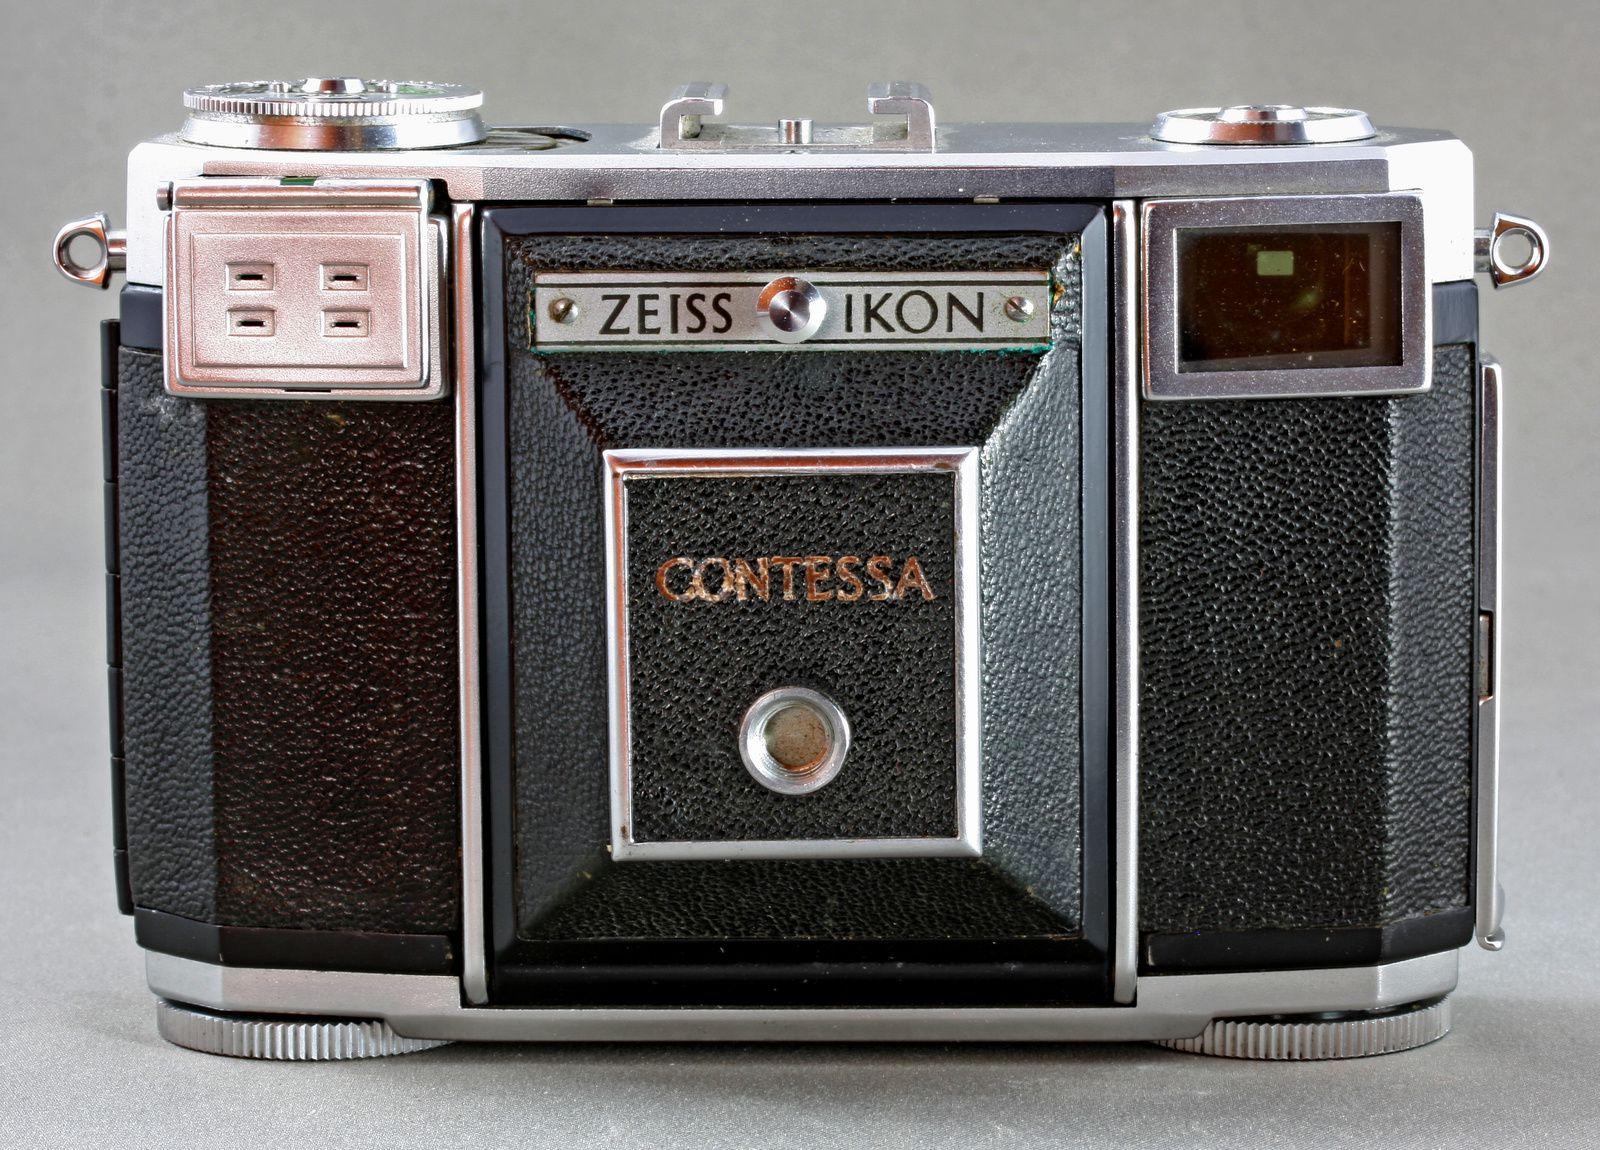 Zeiss-Ikon, Contessa 35